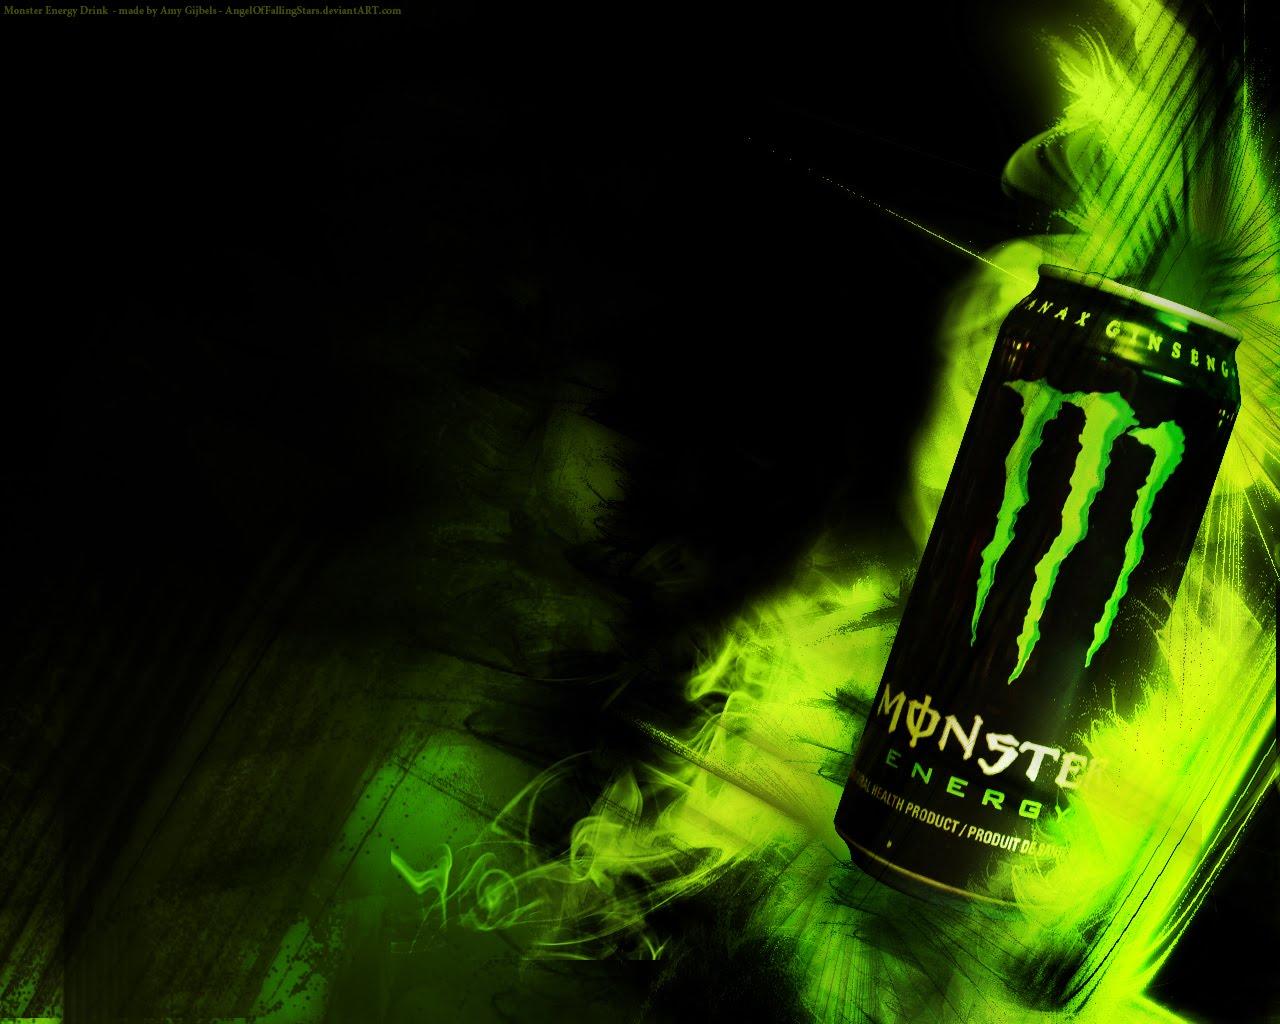 ambiente de trabalho desktop monster monster energy wallpapers 1280x1024